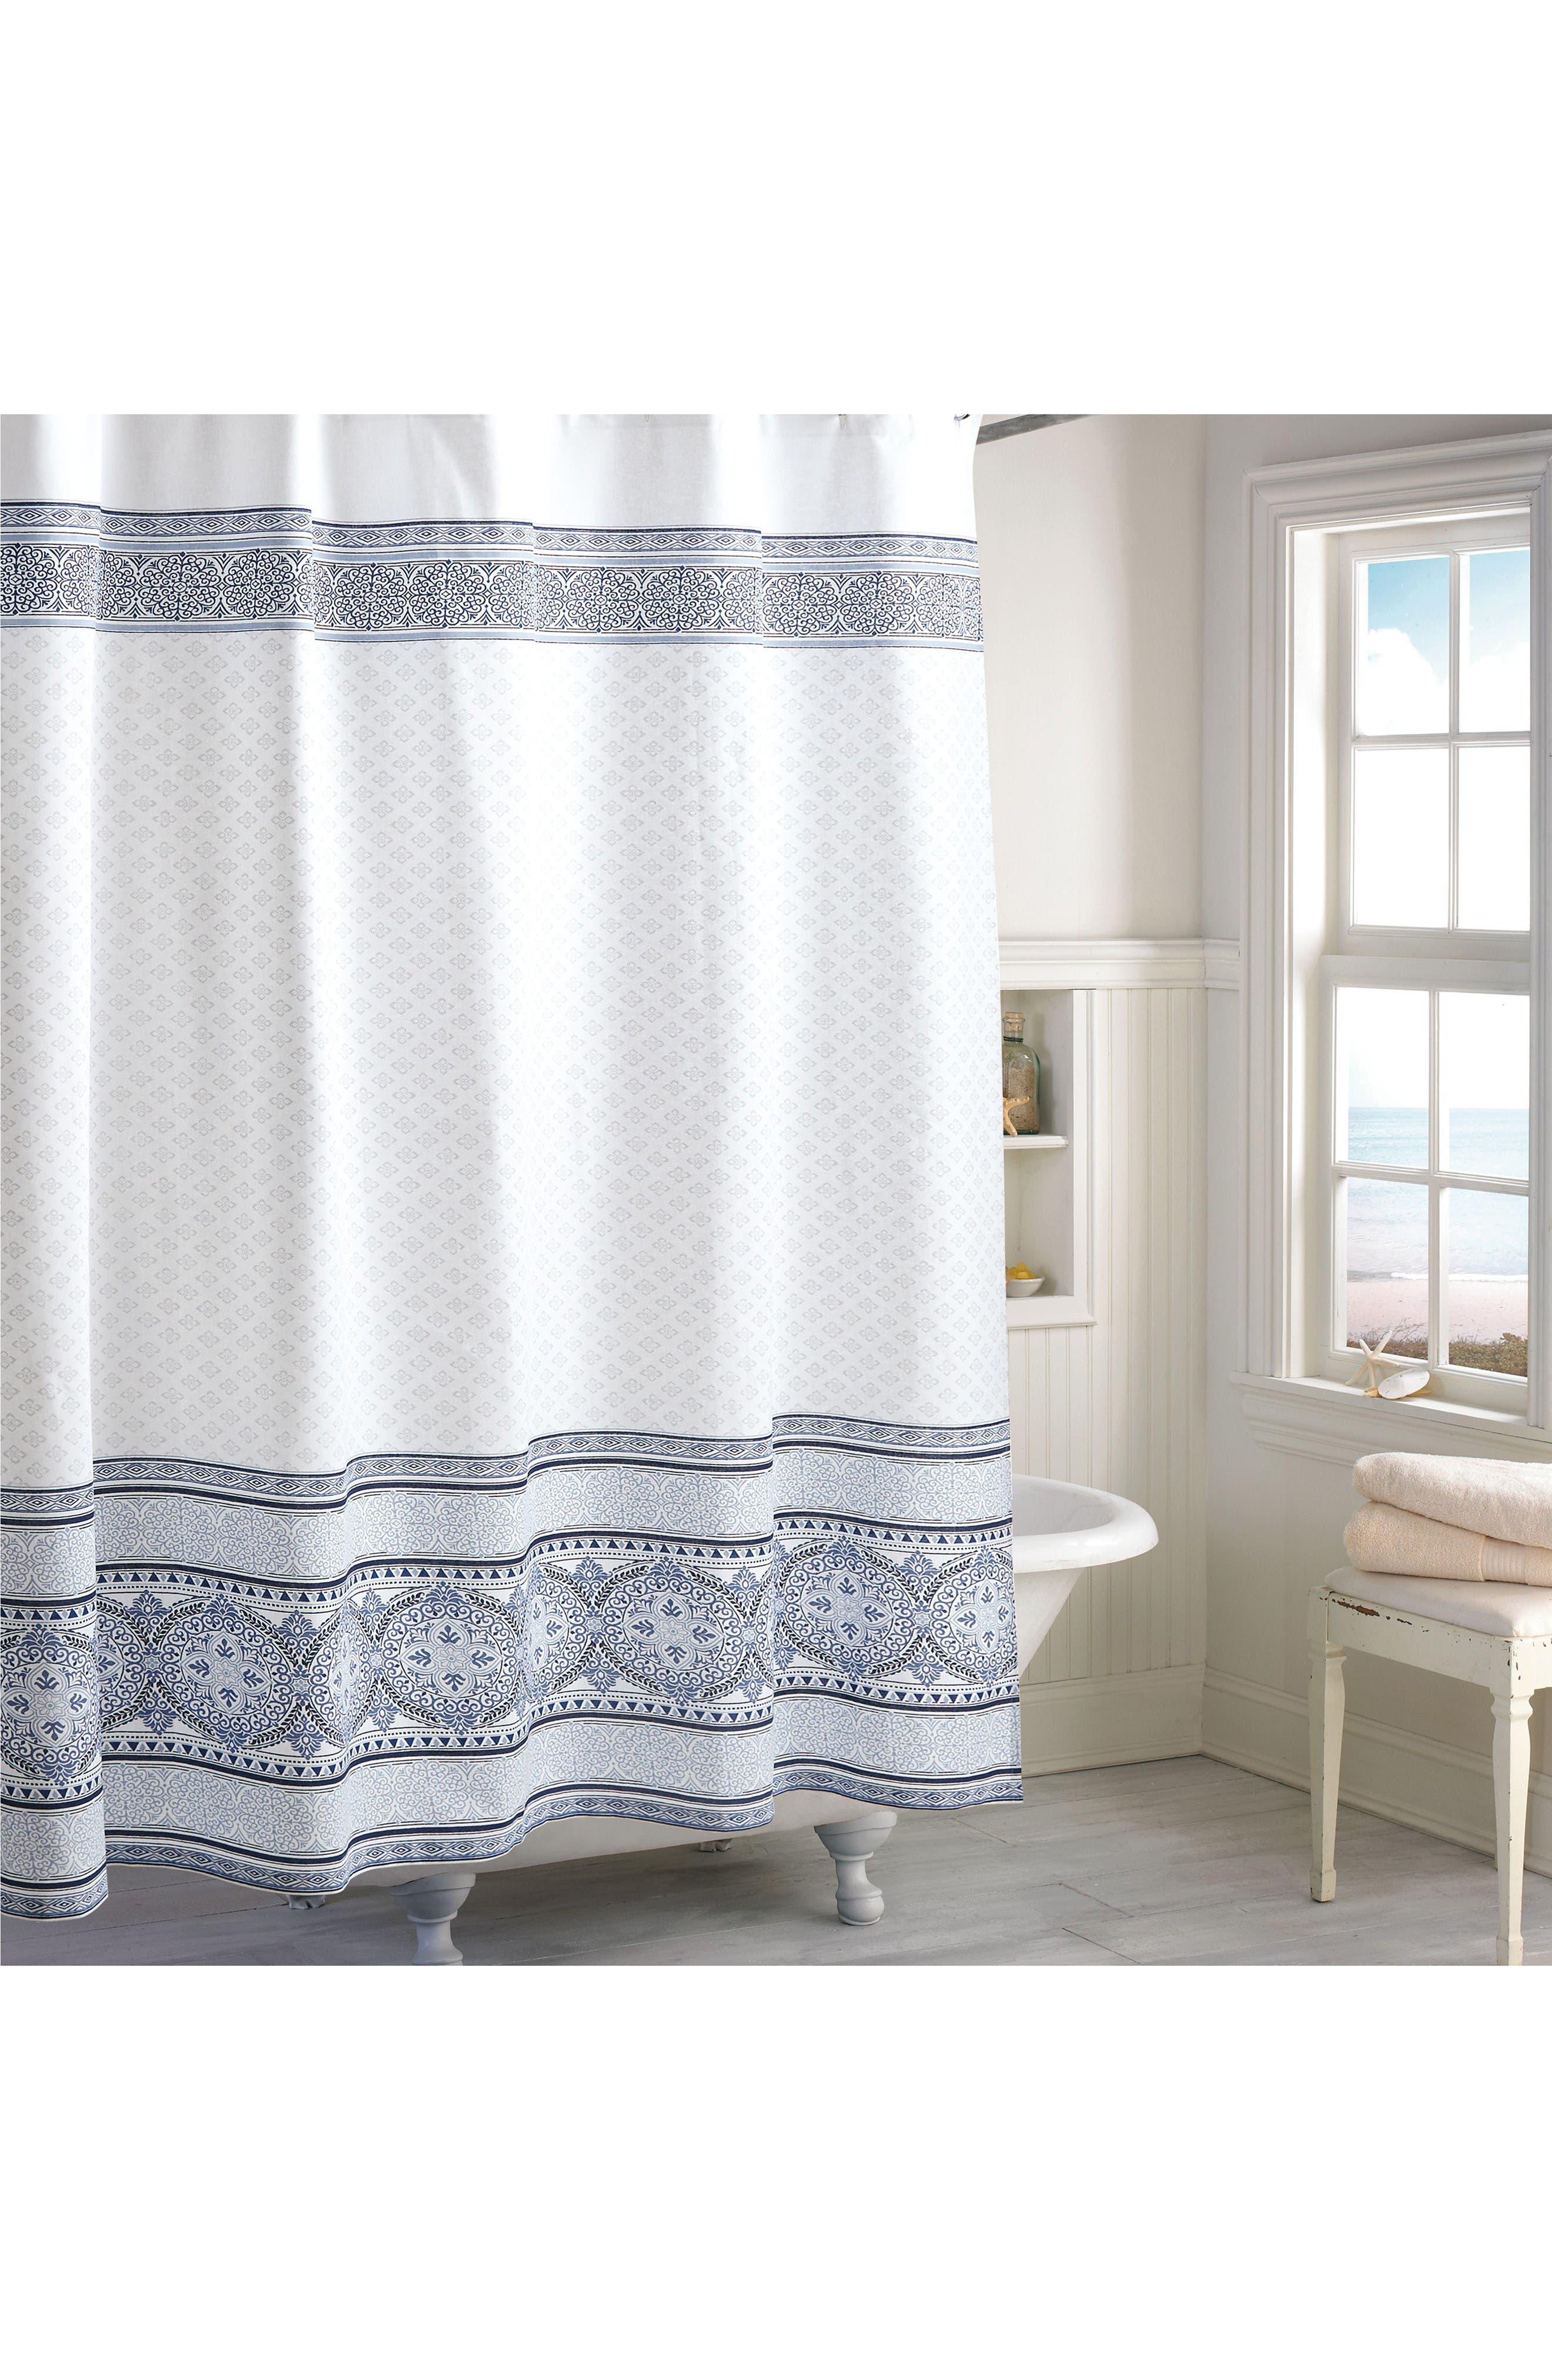 Medallion Border Shower Curtain,                         Main,                         color, Indigo